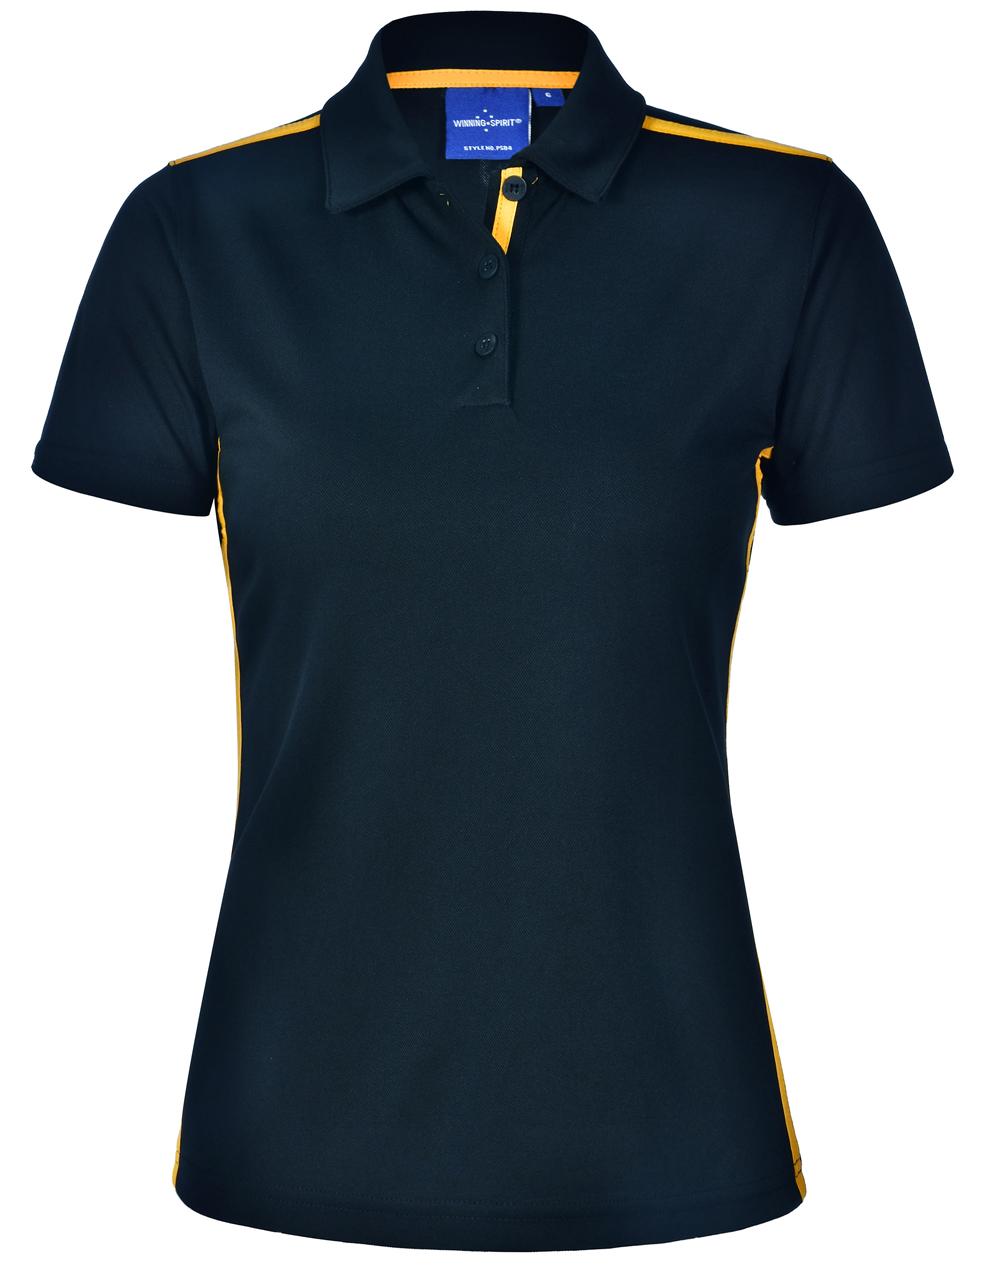 Navy.Gold